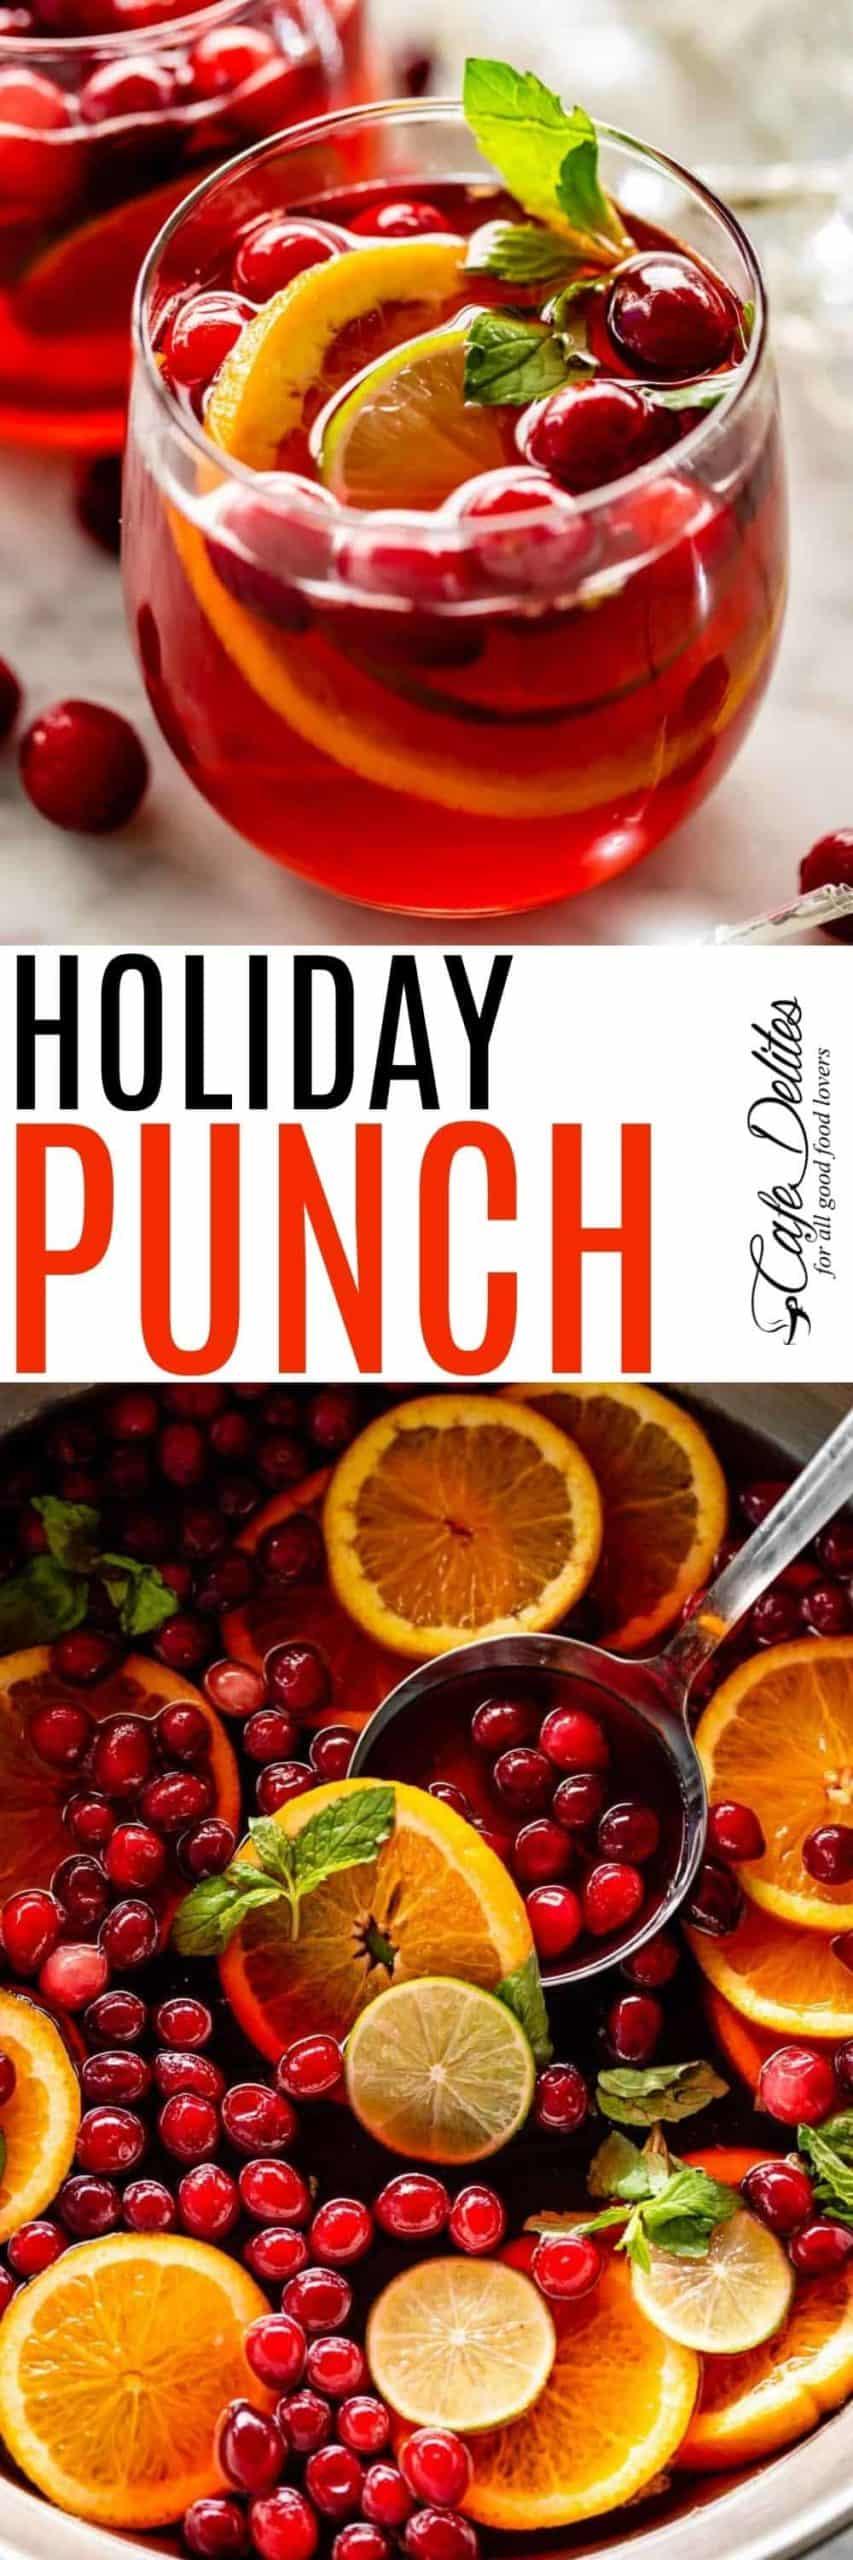 Holiday Punch   cafedelites.com